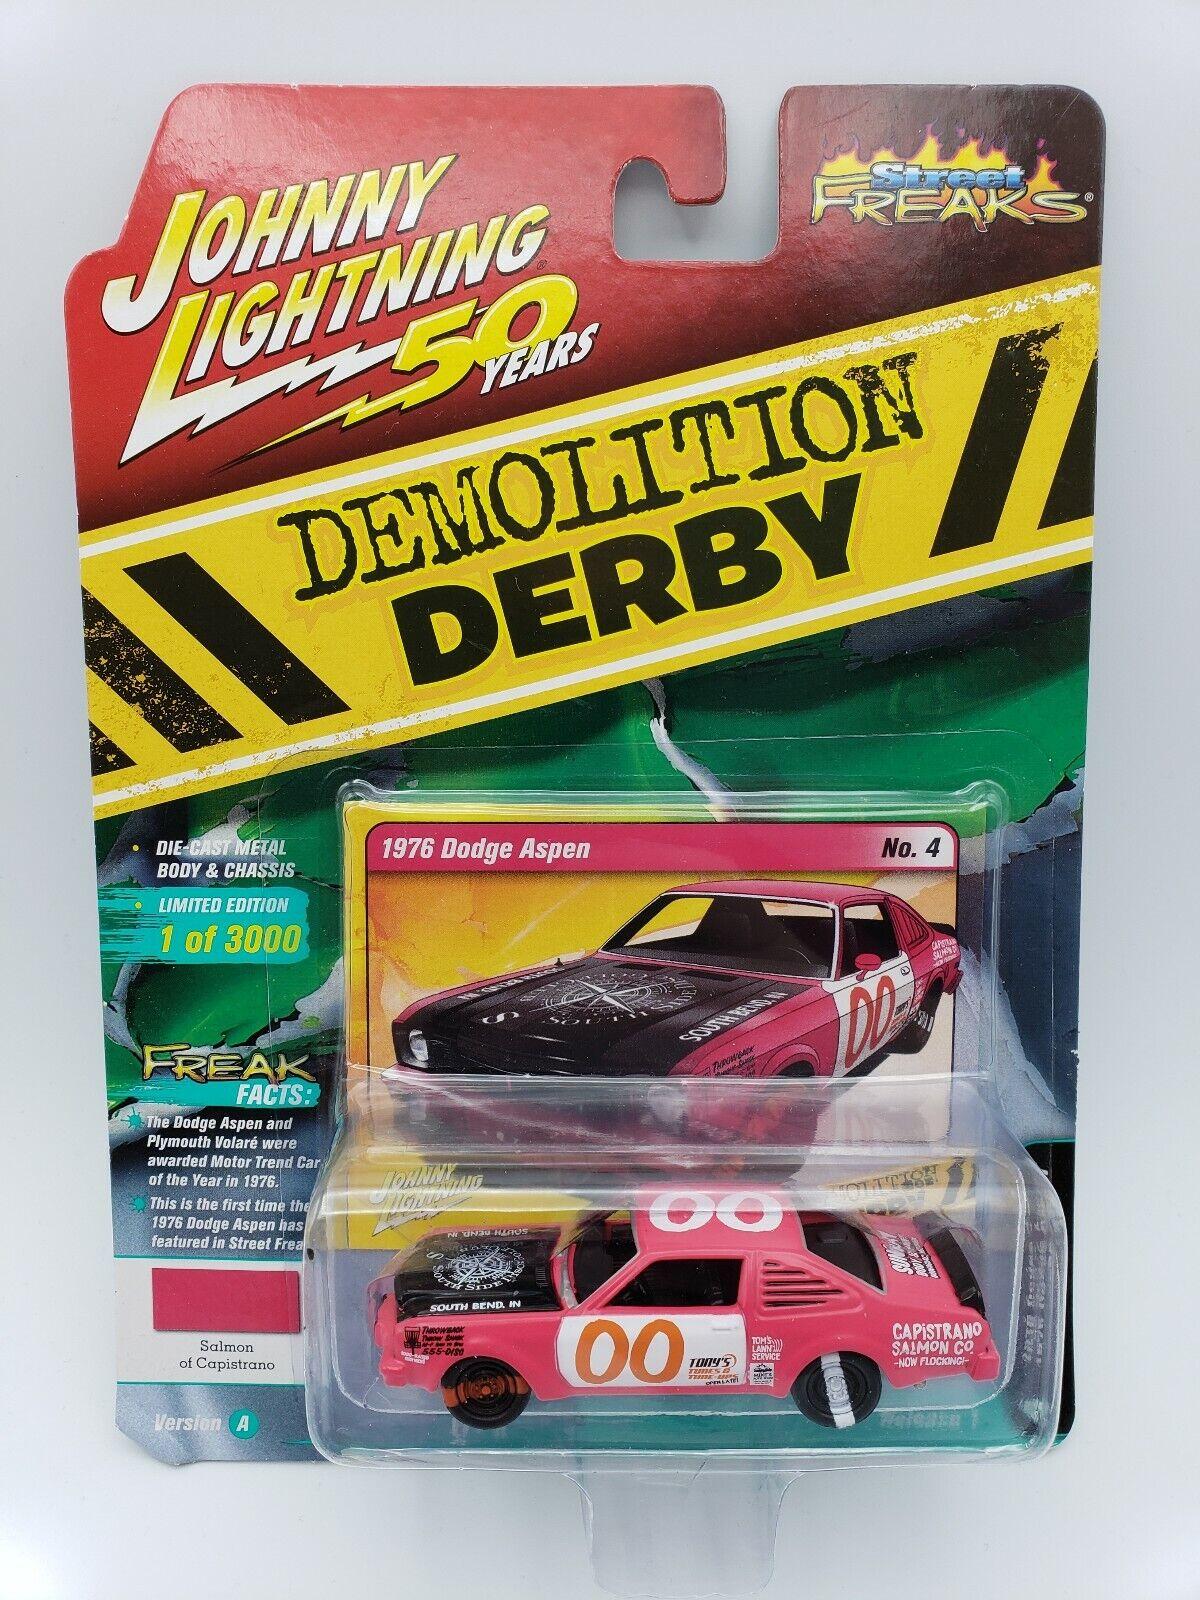 Johnny Lightning 50 Years 1999 Nissan Skyline GT-R Limited Edition N°3 N39